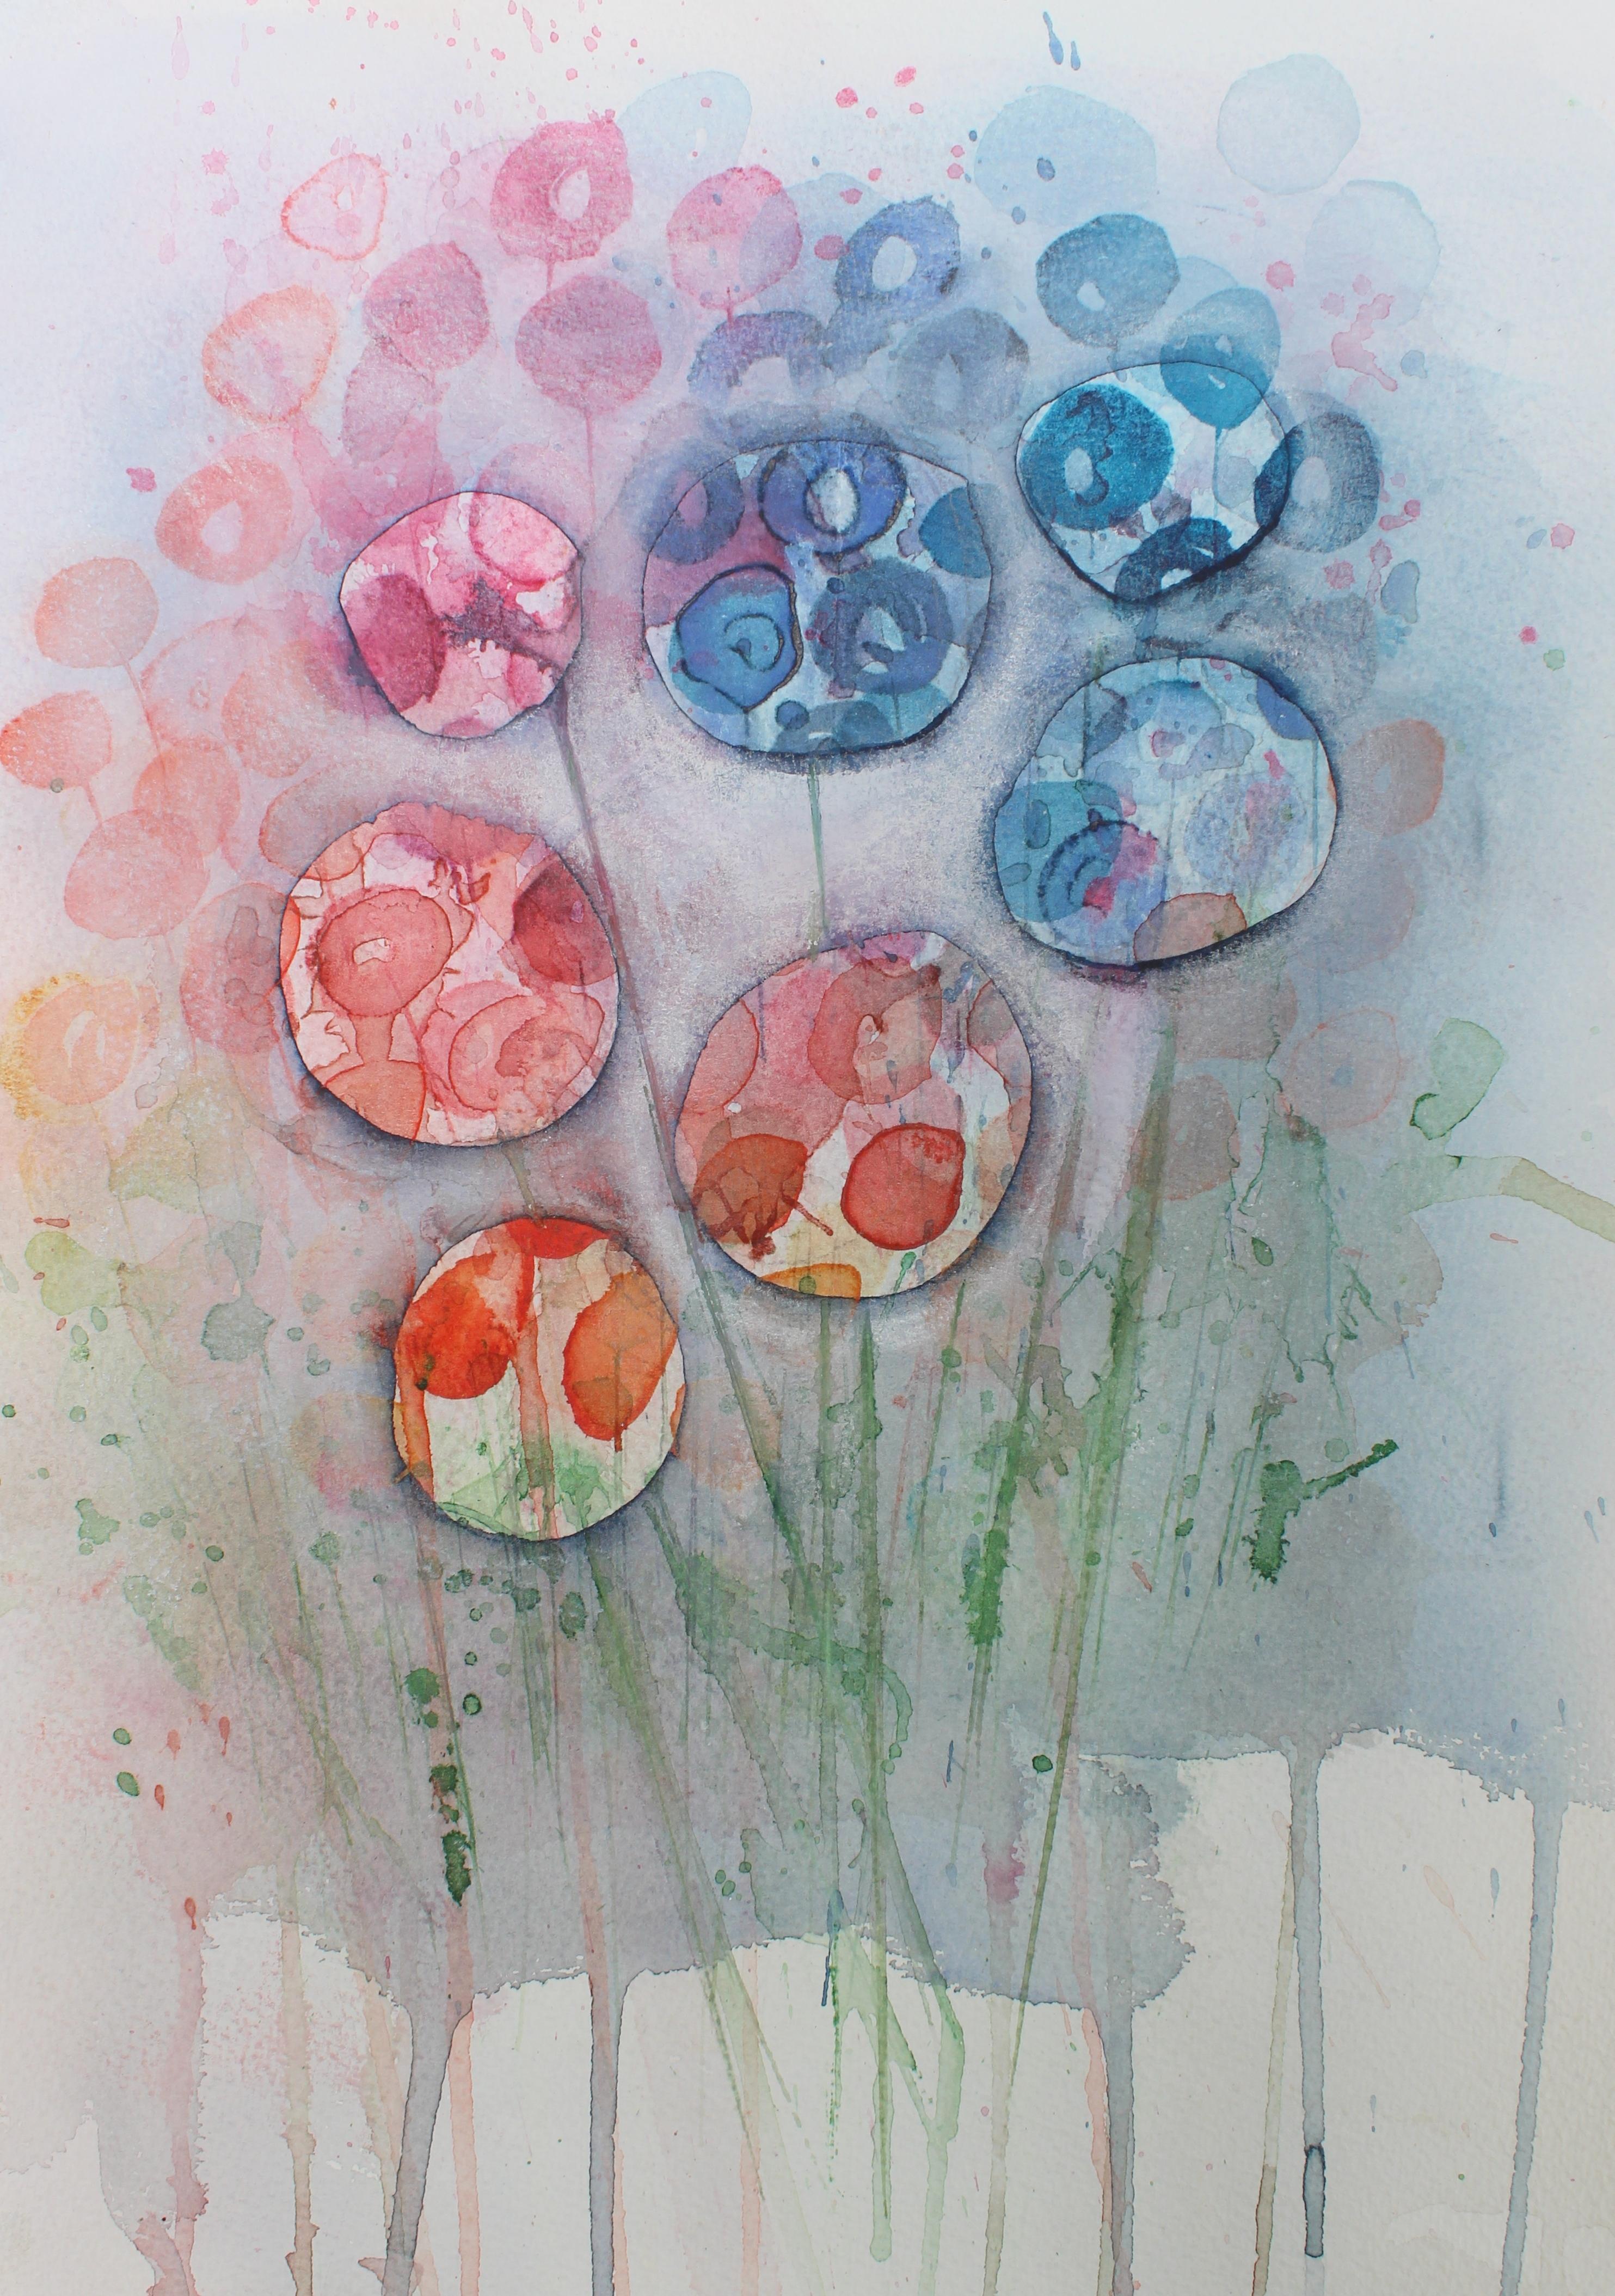 Jude Fenton Art  - A112